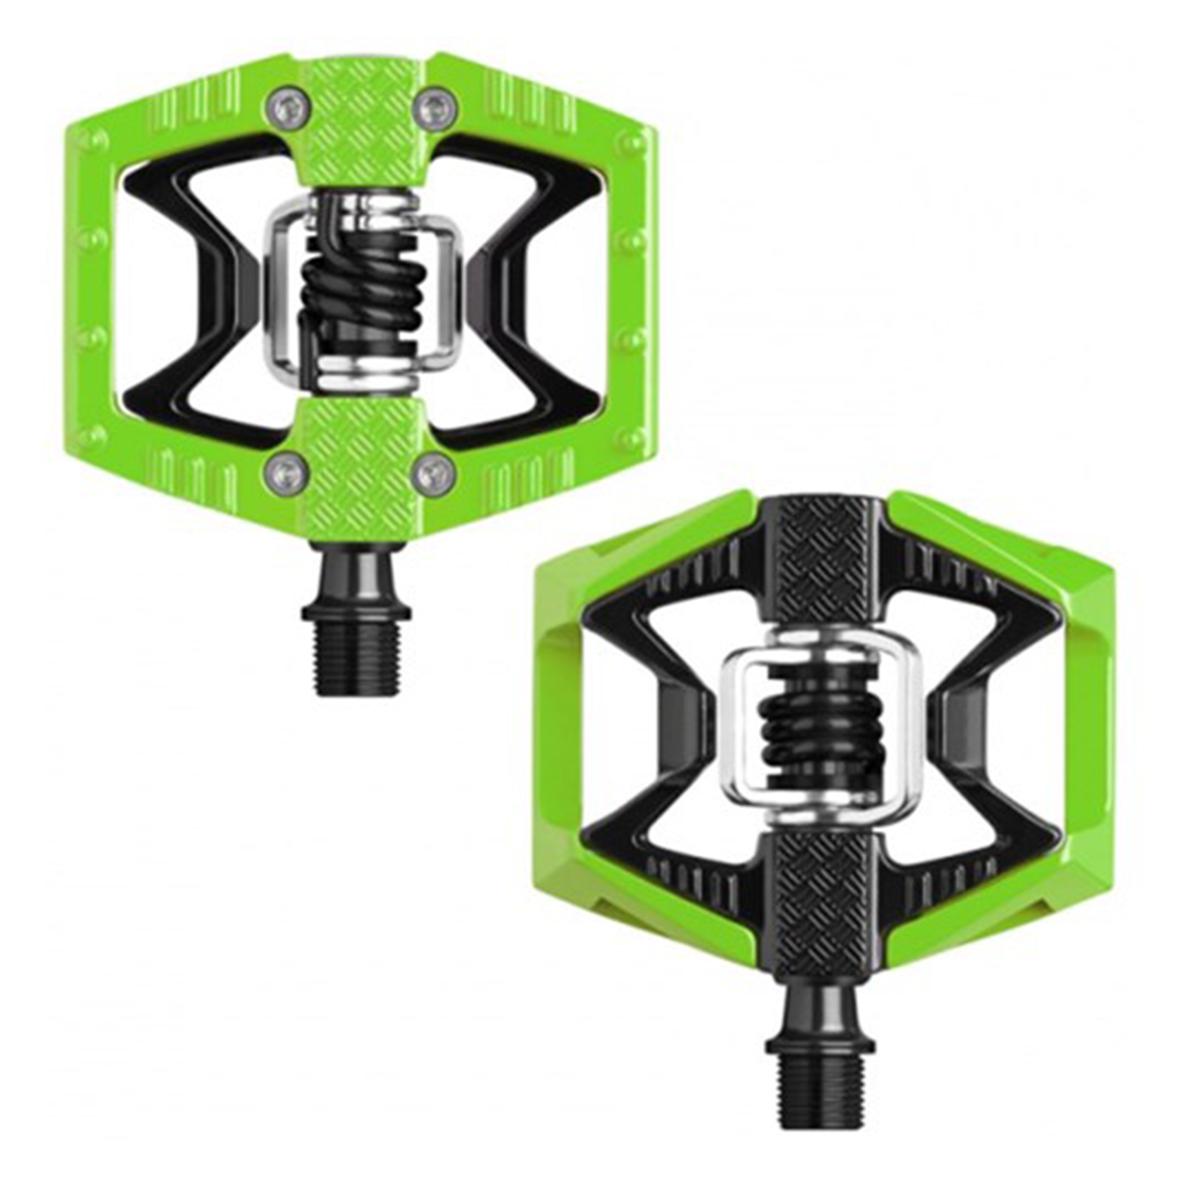 Doubleshot Green - SGD $110